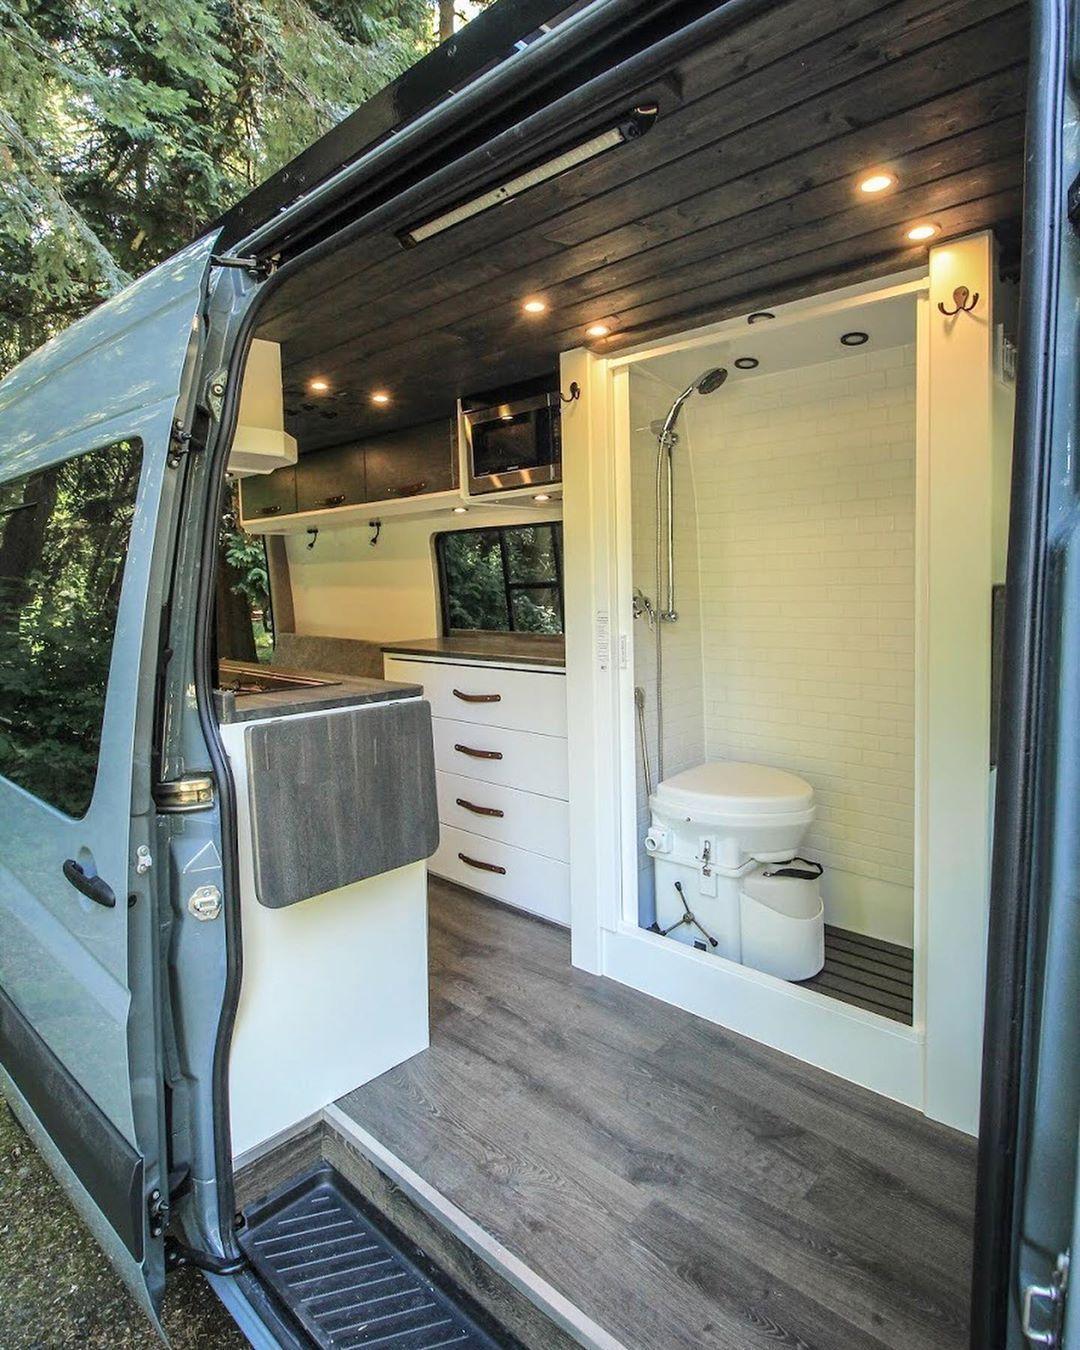 15 Perfect Small Campers Van Life Diy Van Living Small Campers